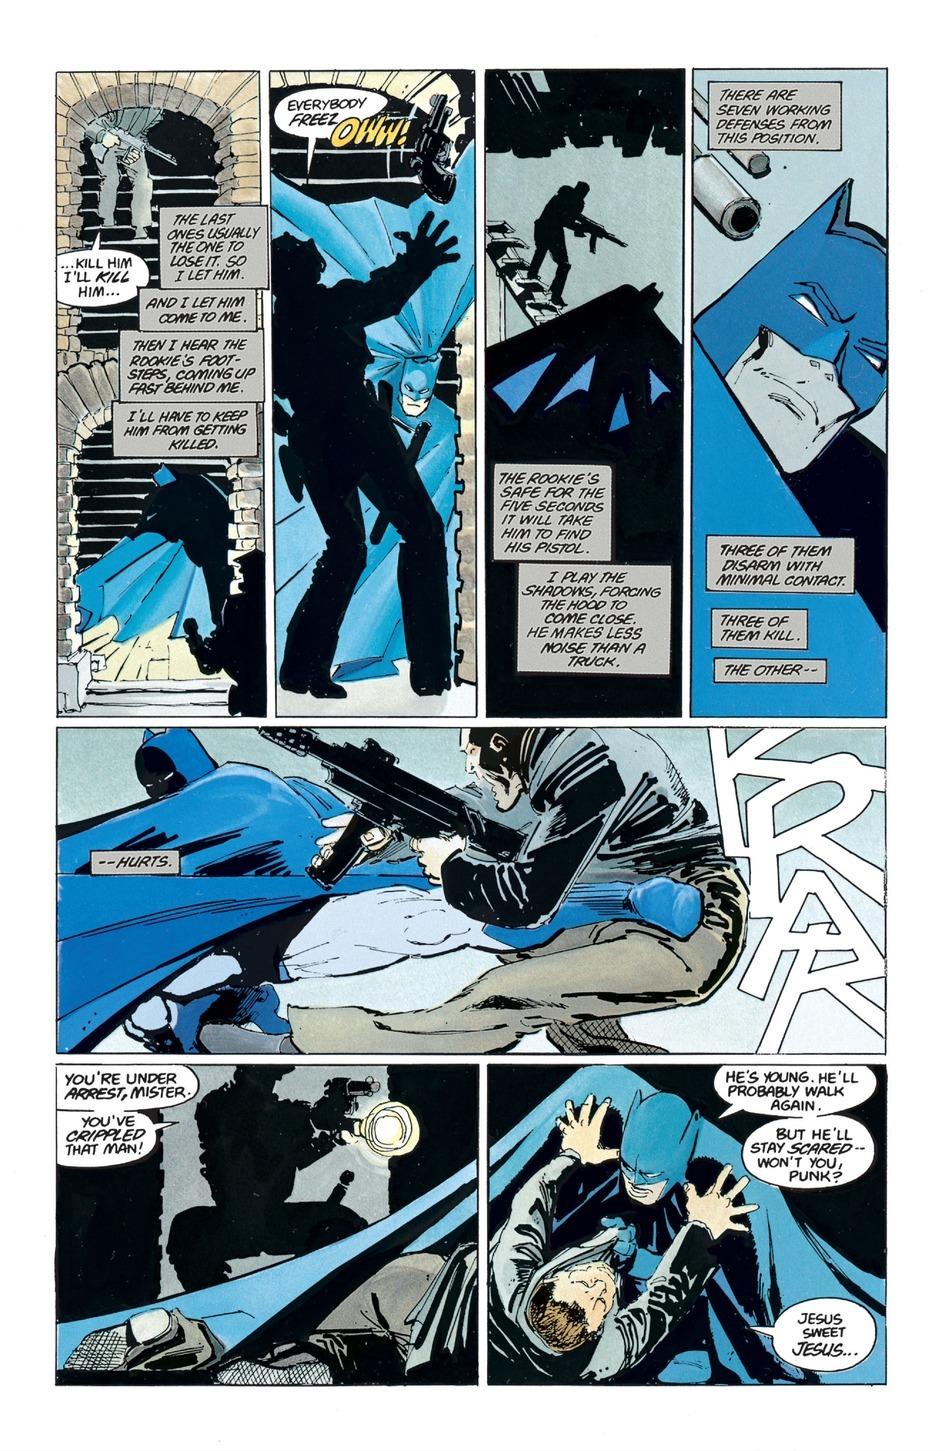 Psychology of Bruce Wayne TKDR